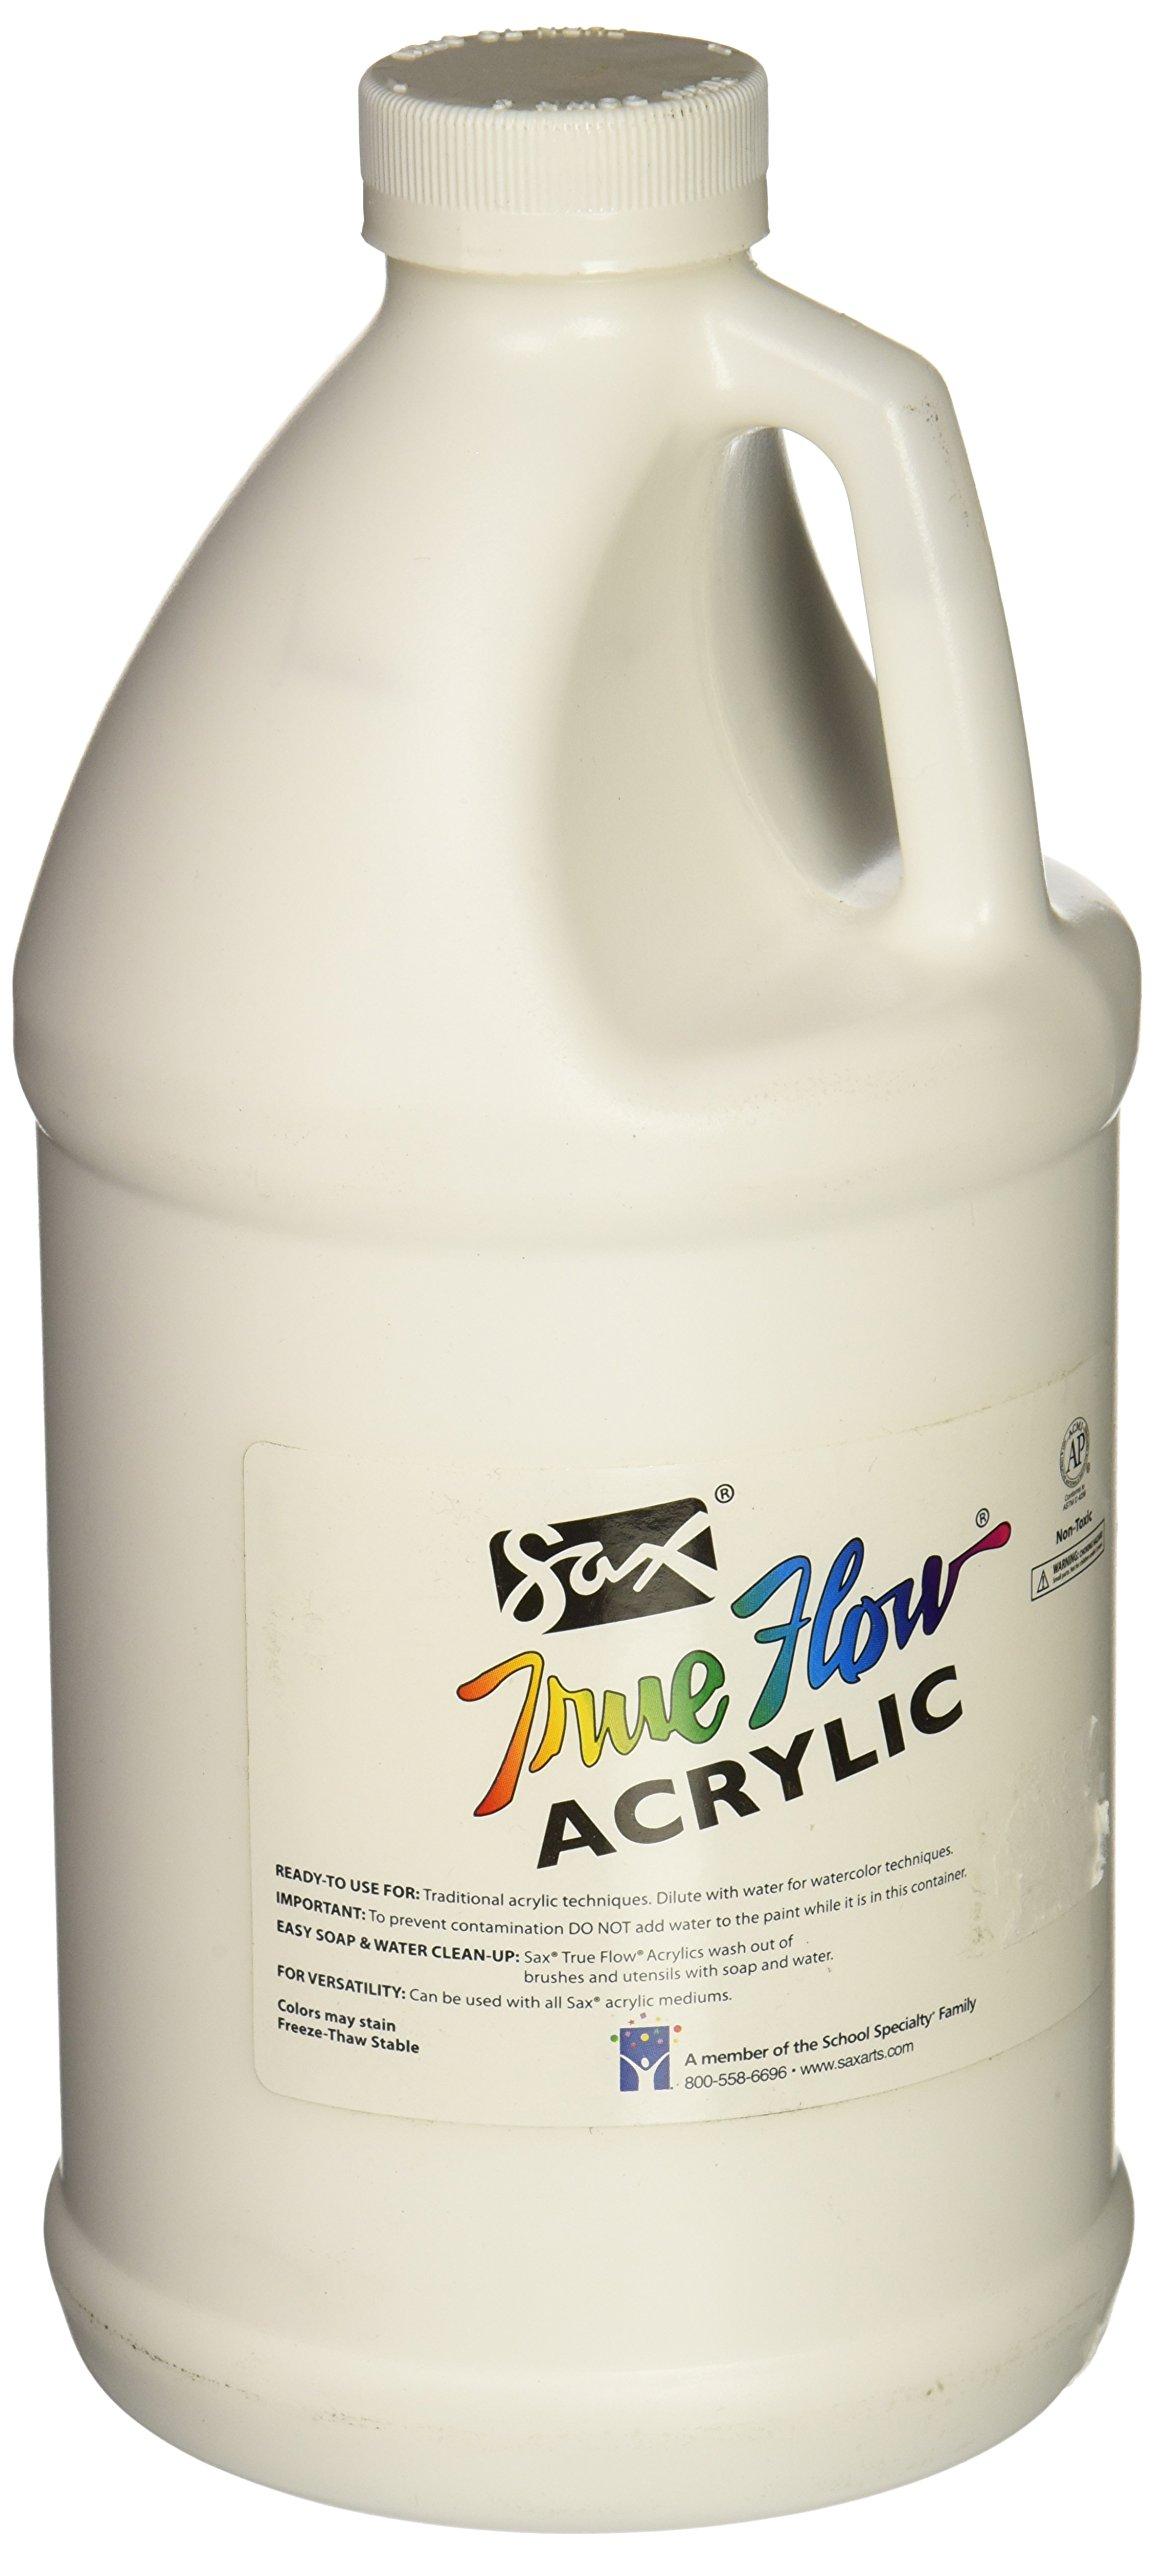 Sax True Flow Heavy Body Acrylic Paint, 1/2 Gallon, Titanium White - 439301 by Sax